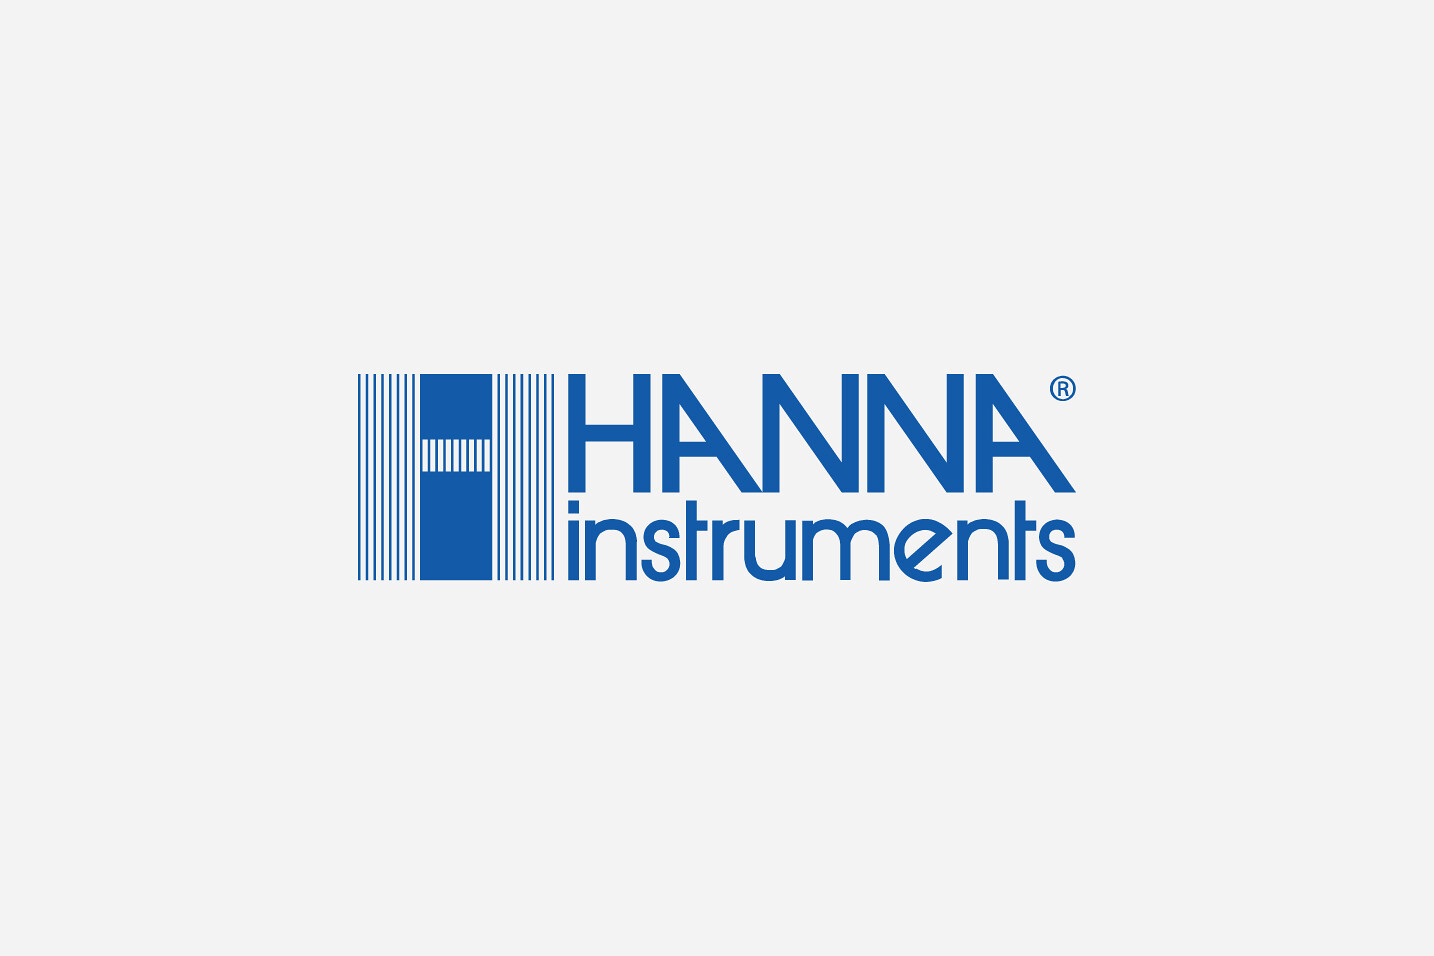 Hanna HI736 超低濃度磷離子比色計「磷 ↔ 磷酸鹽」對照表